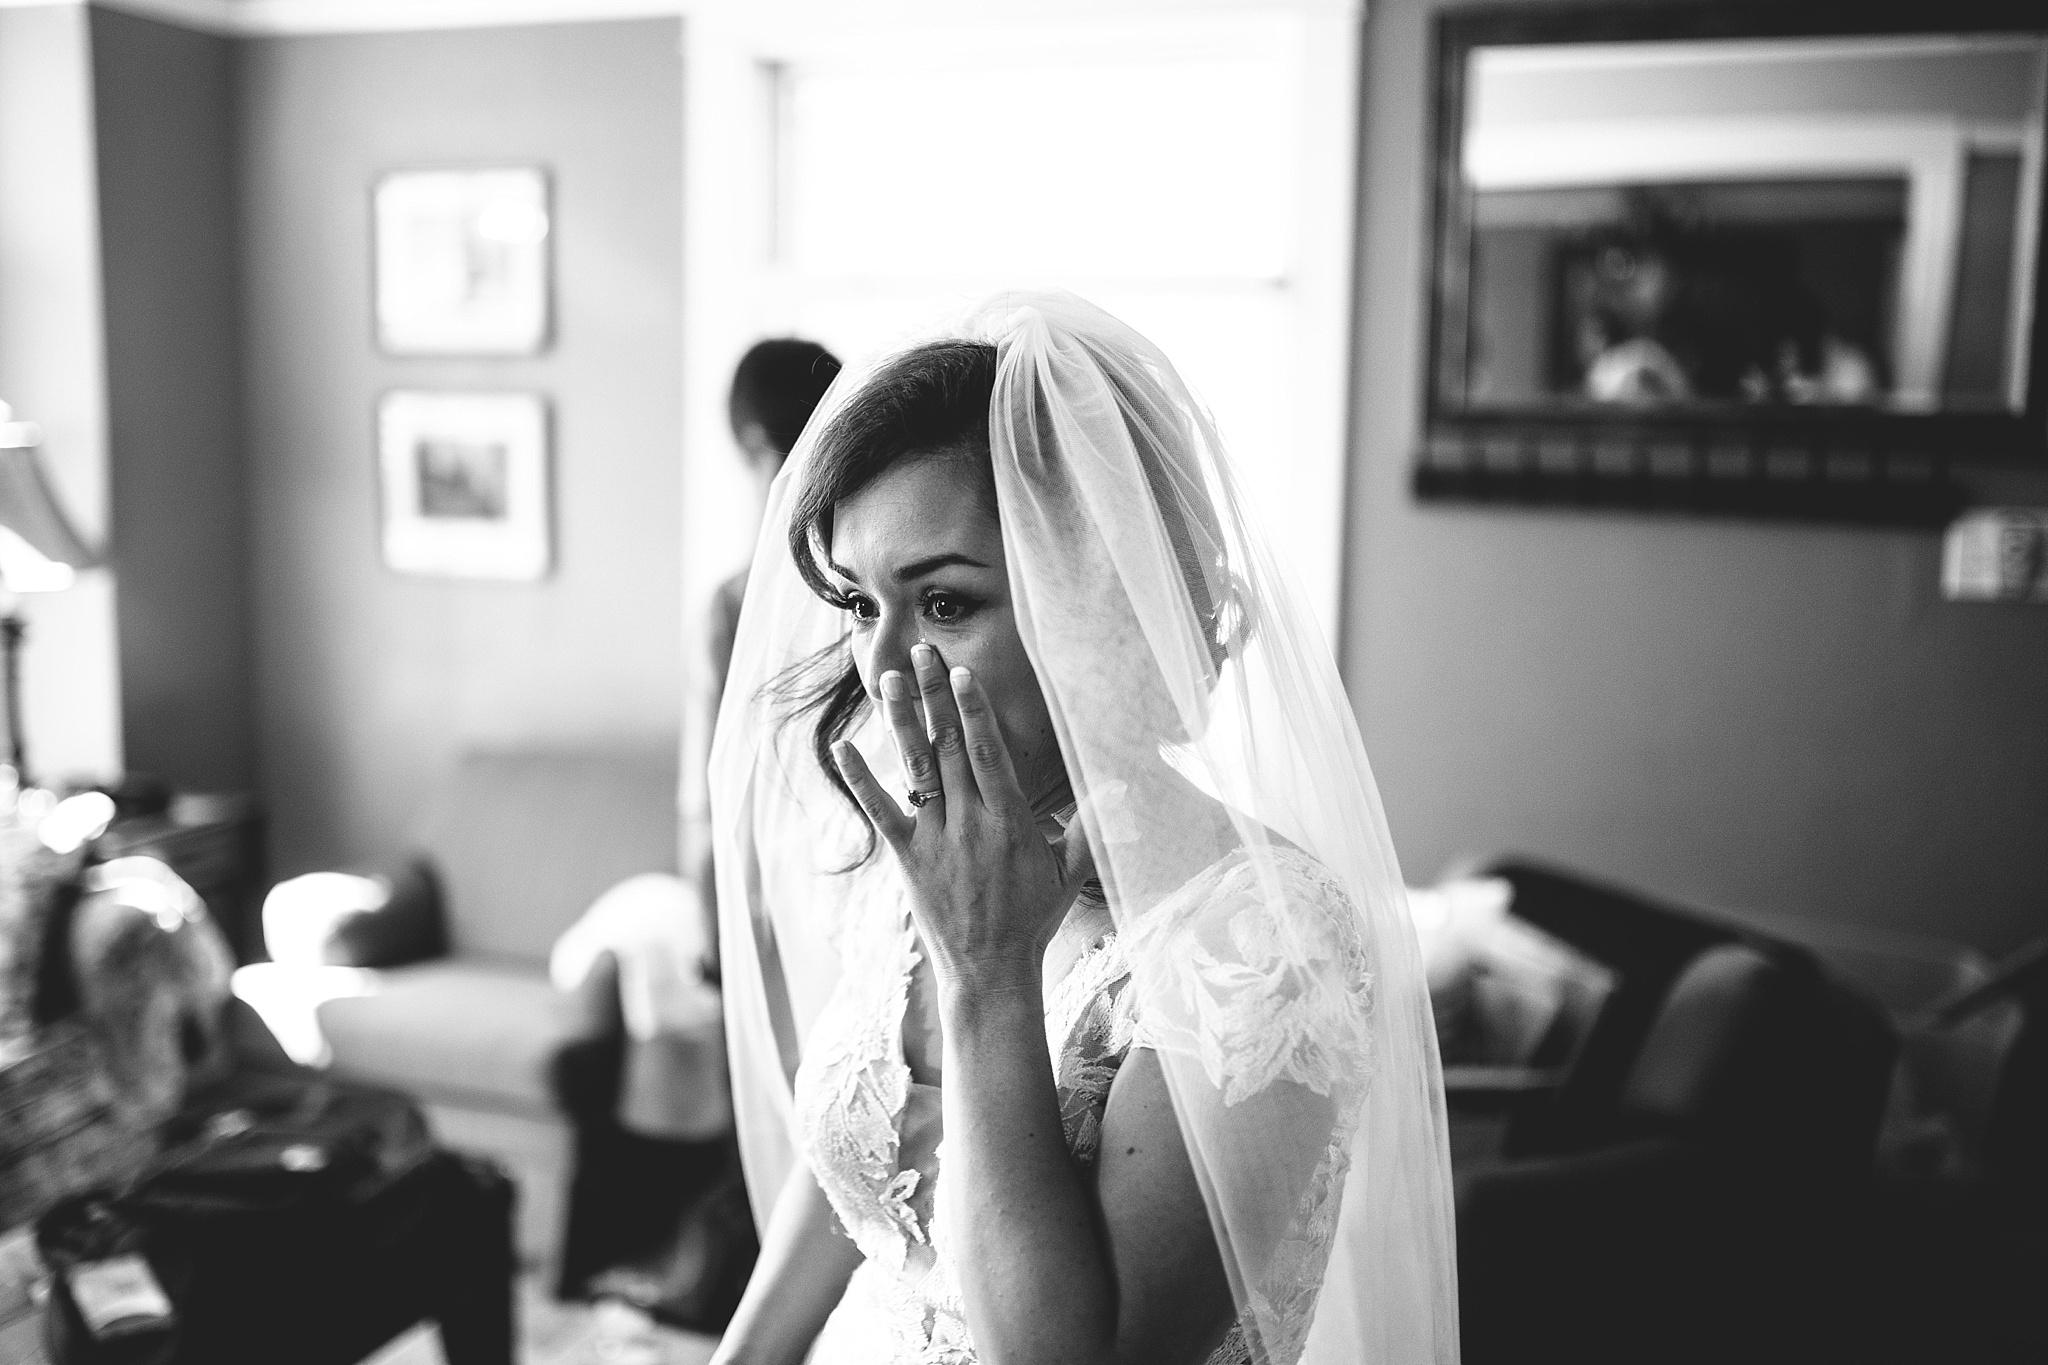 washington bride wipes tear